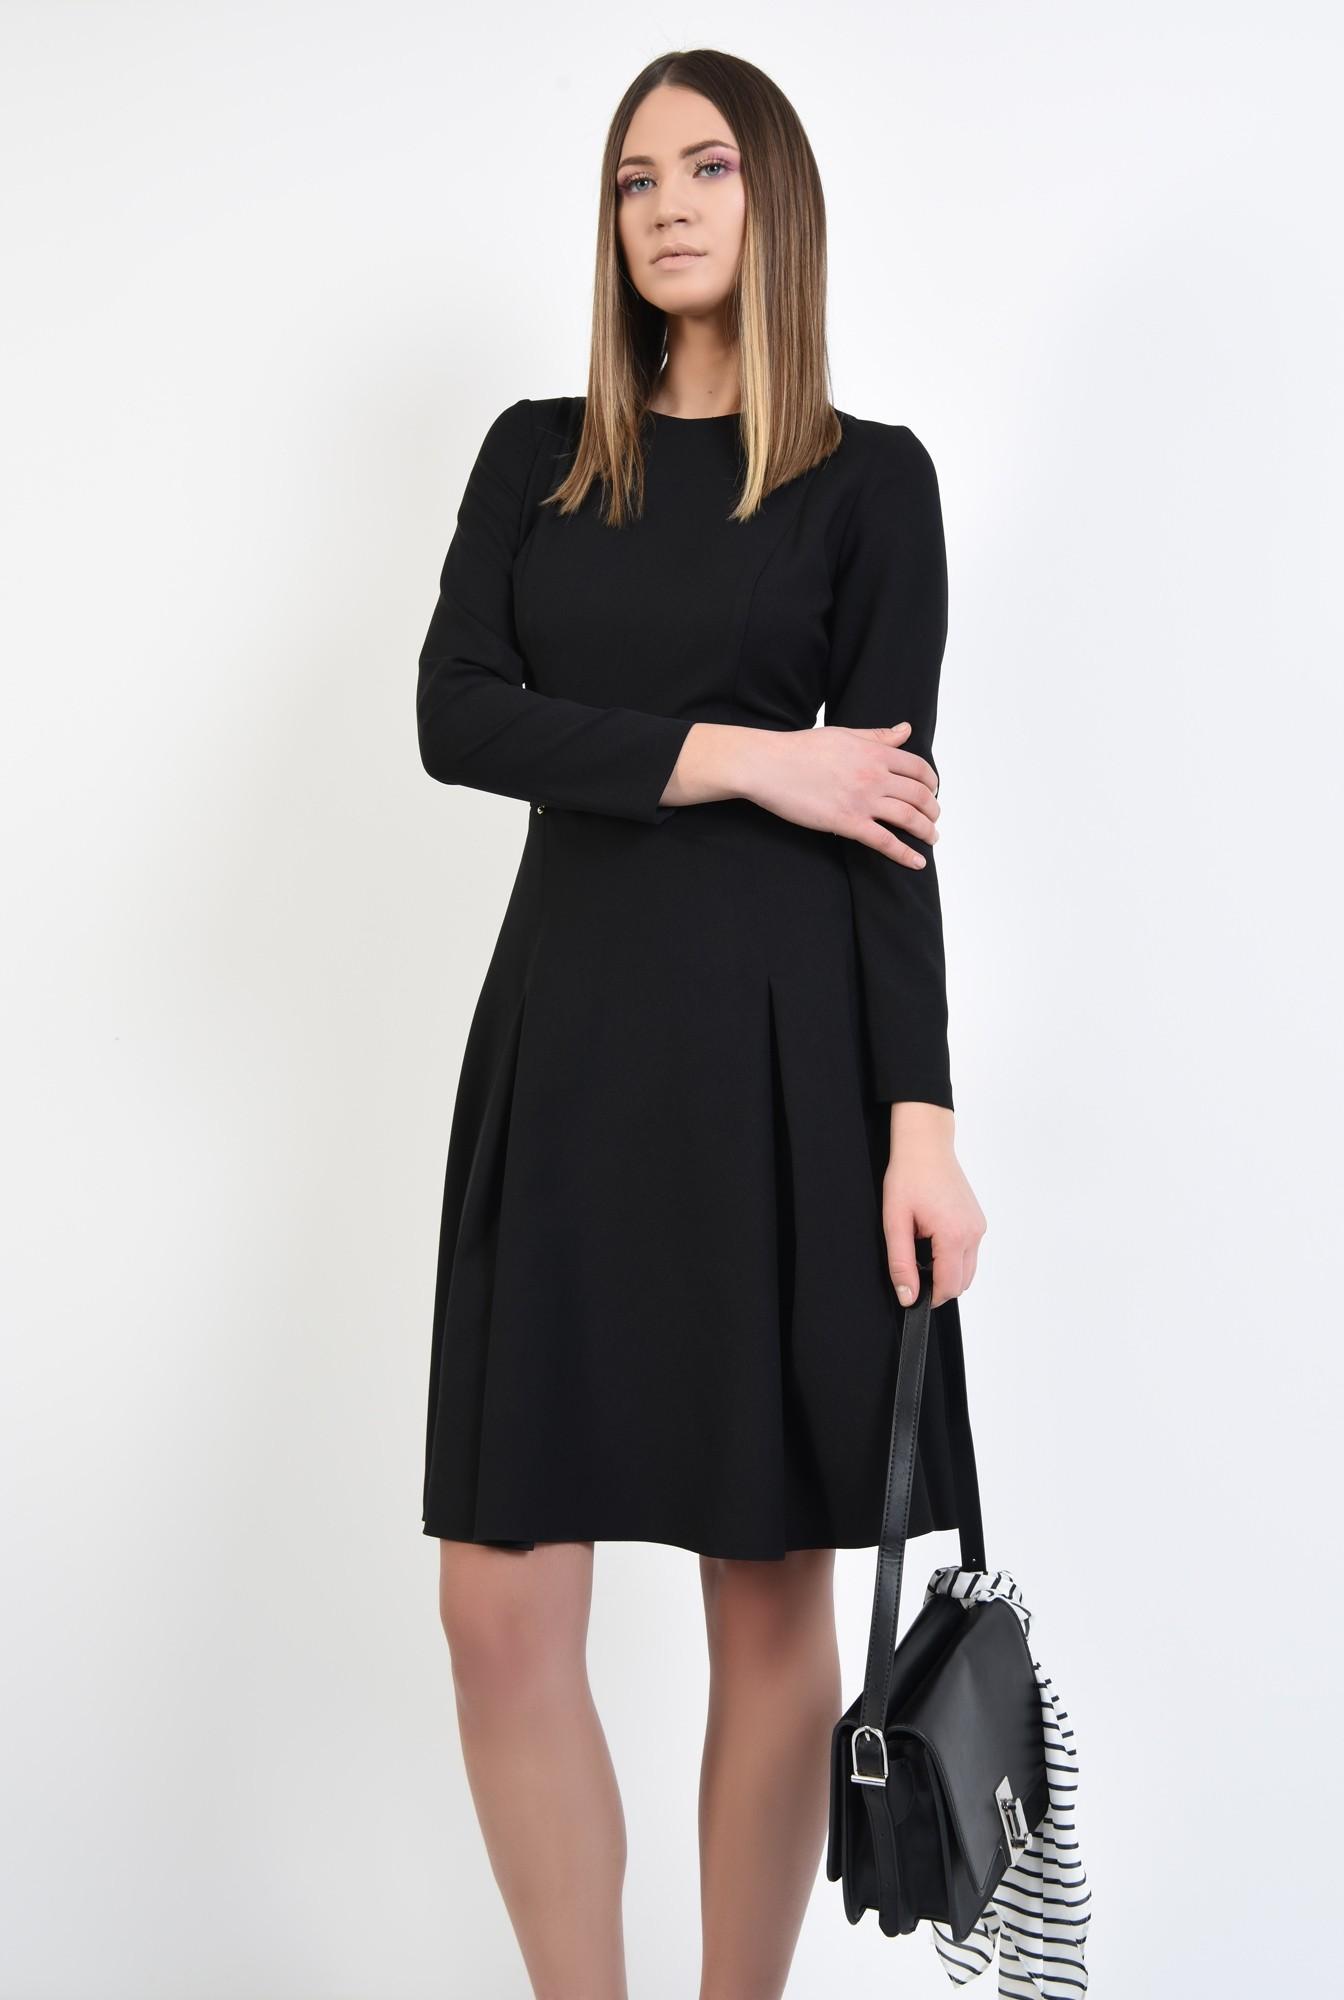 2 - rochie neagra, midi, din crep, maneci lungi ajustate